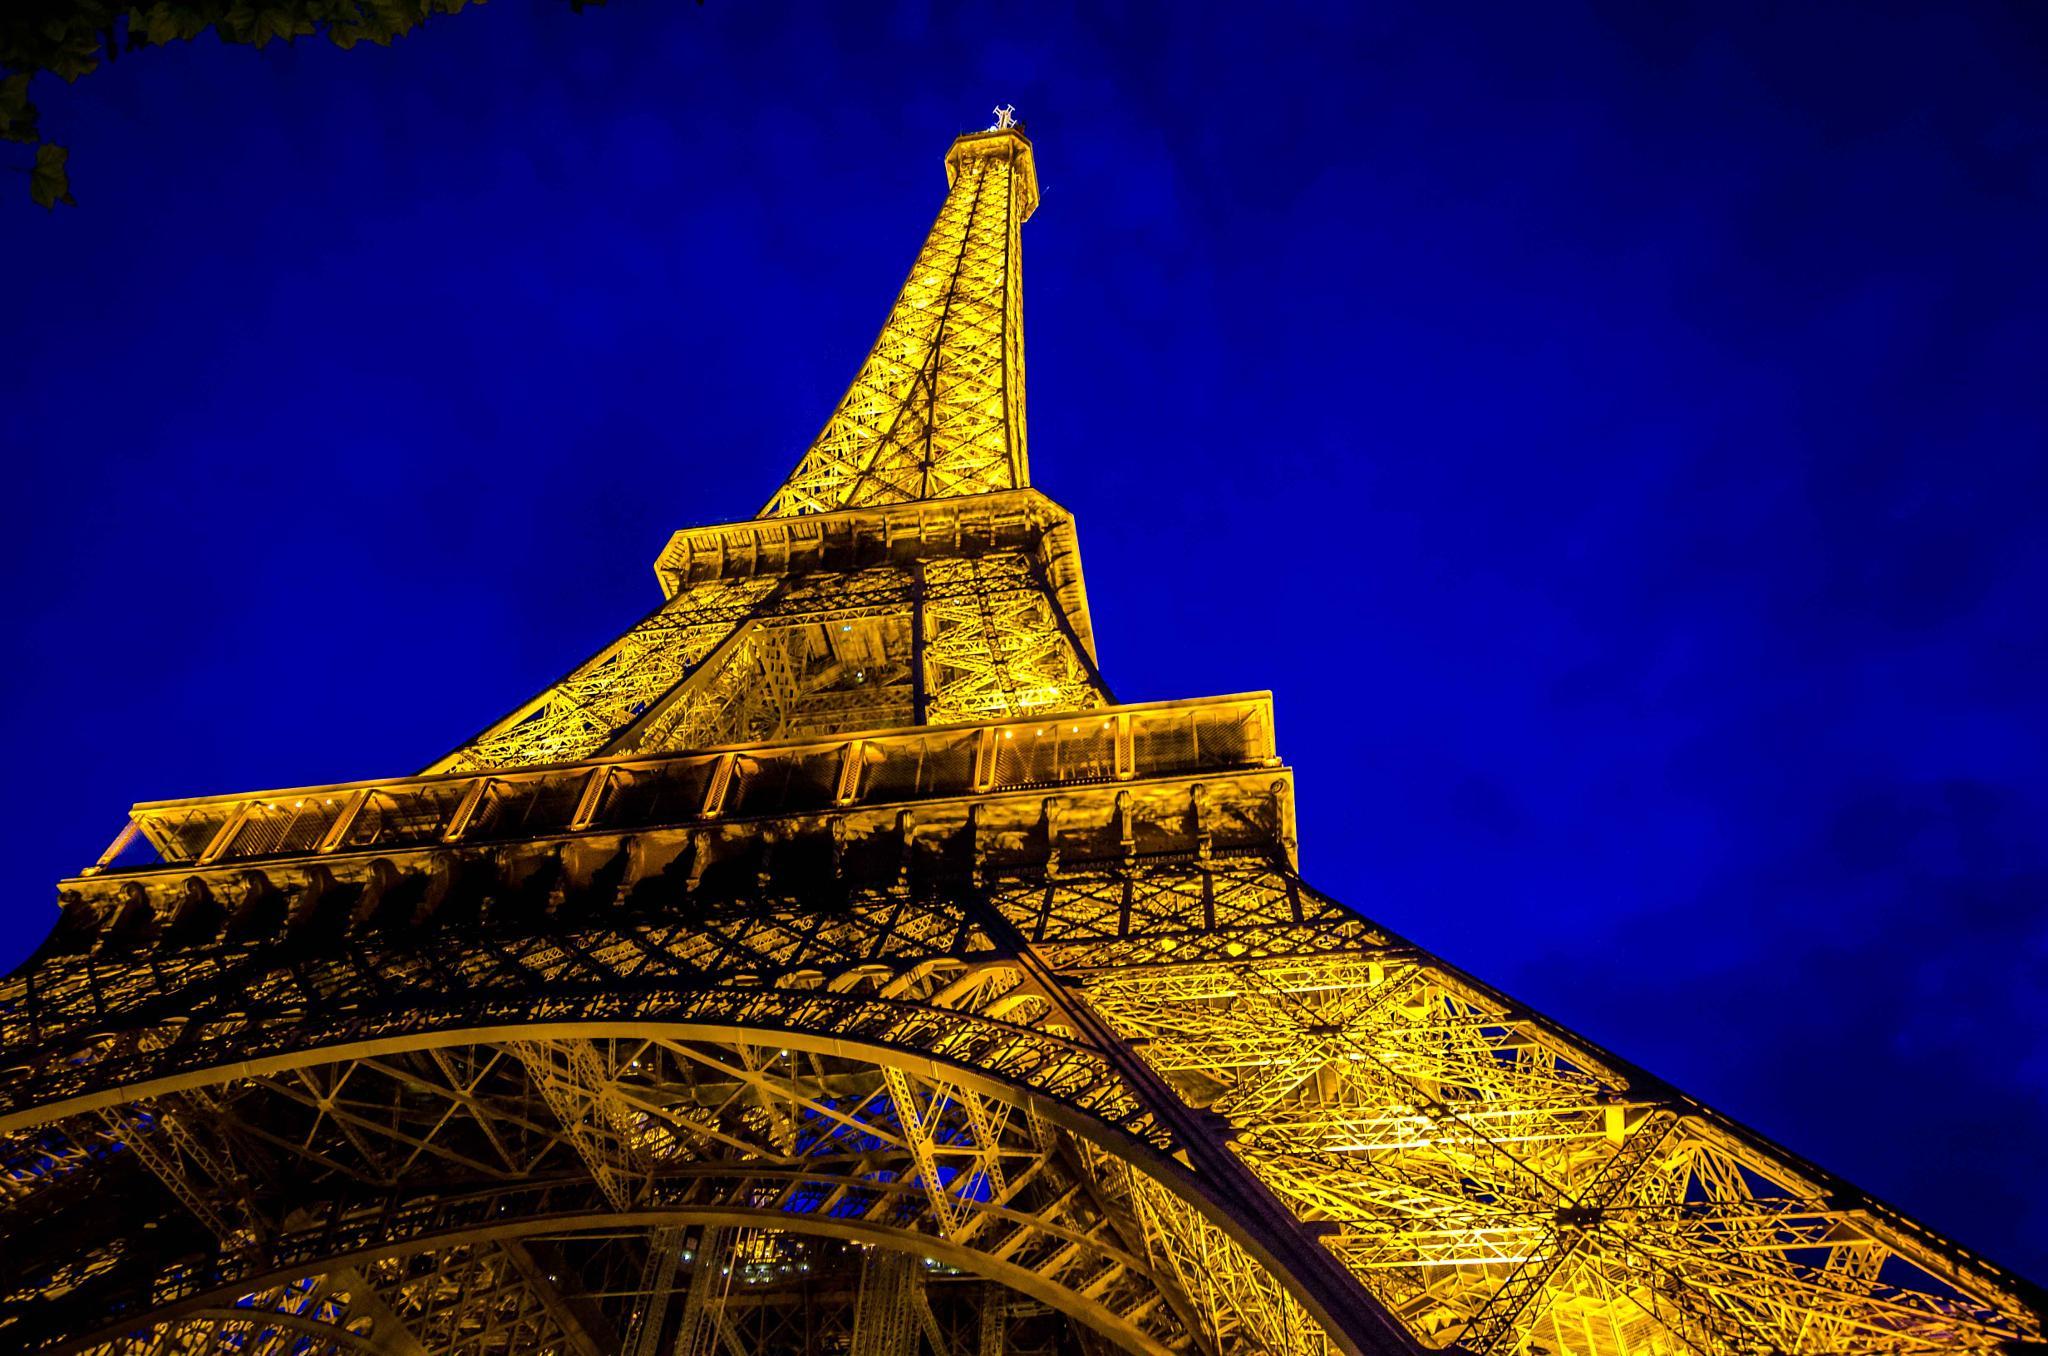 Eiffel Tower by GreenGhost